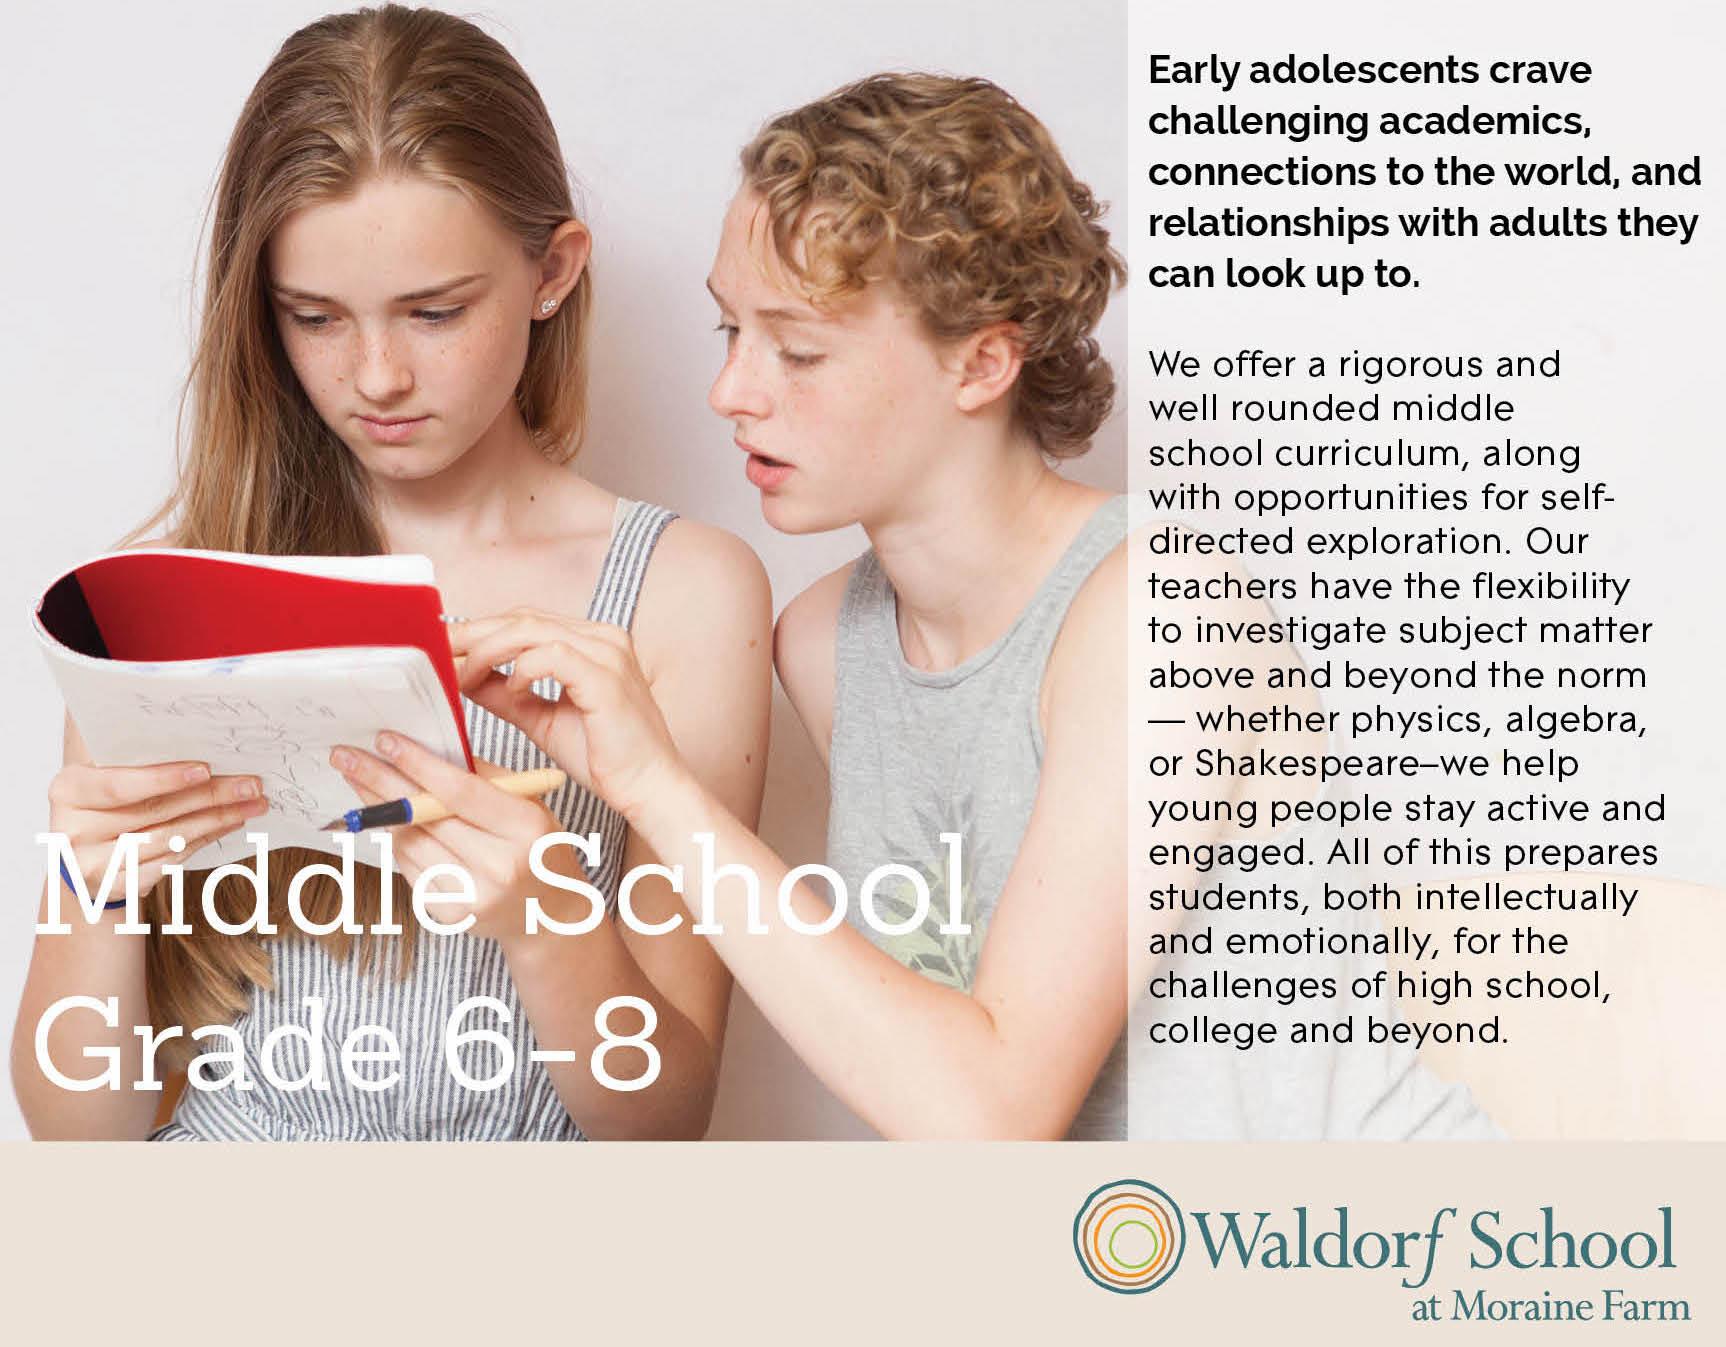 Middle School Curriculum Night | Waldorf School at Moraine Farm